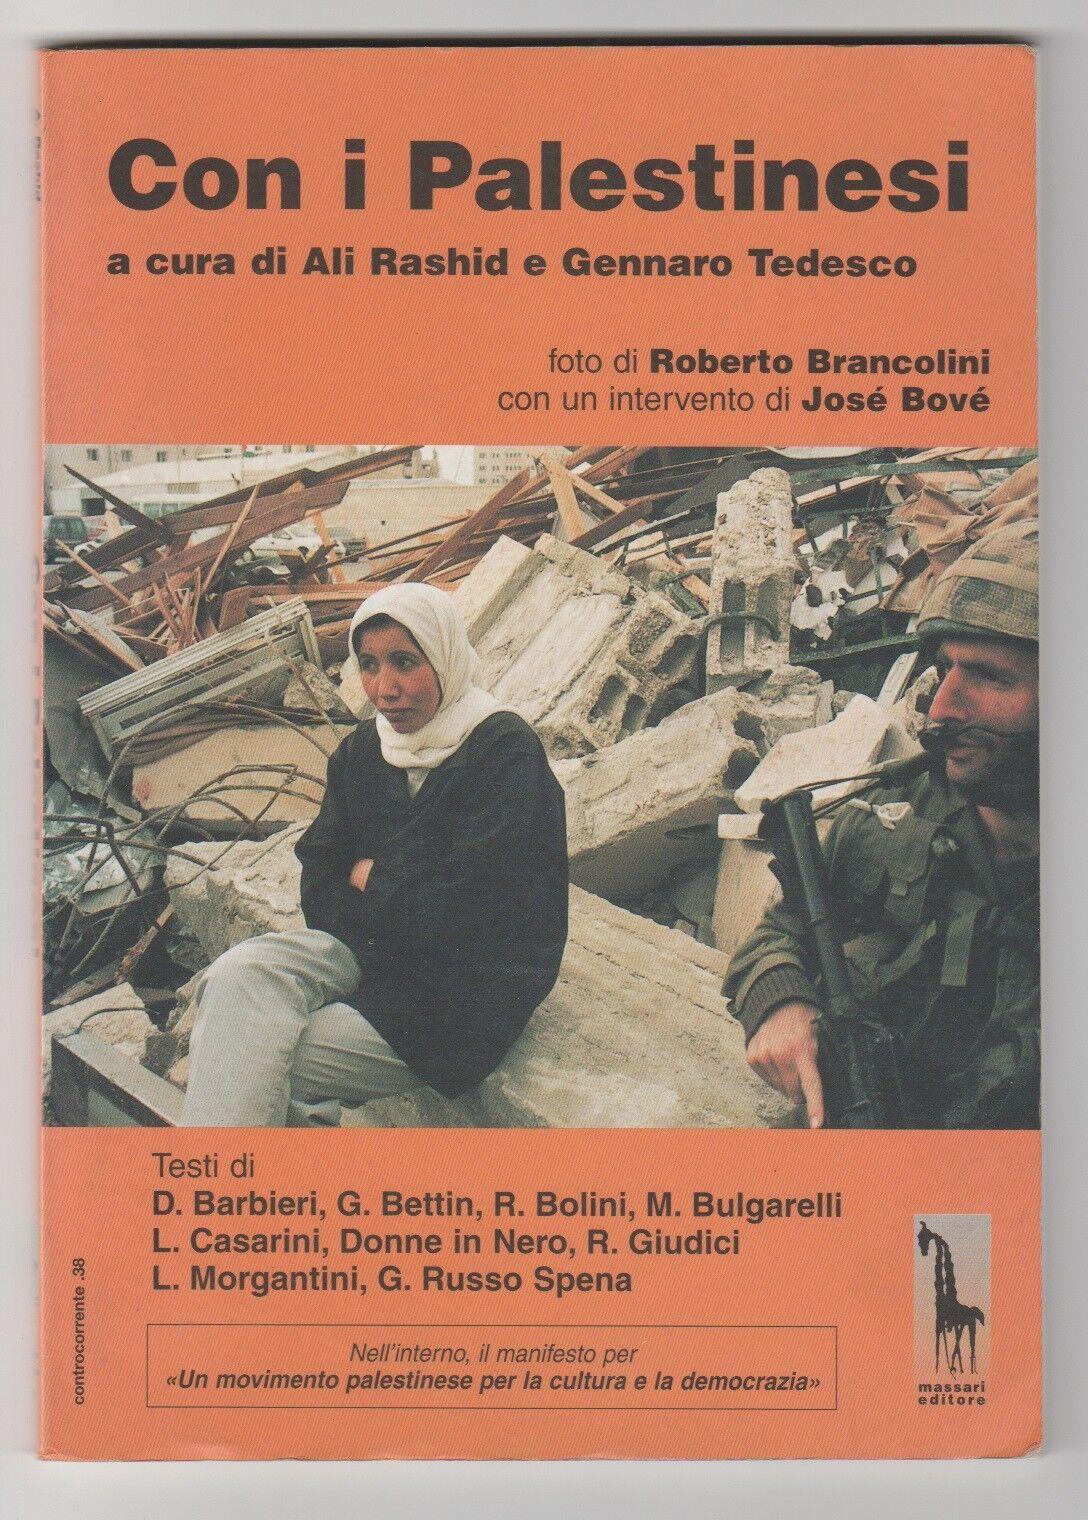 Con i palestinesi